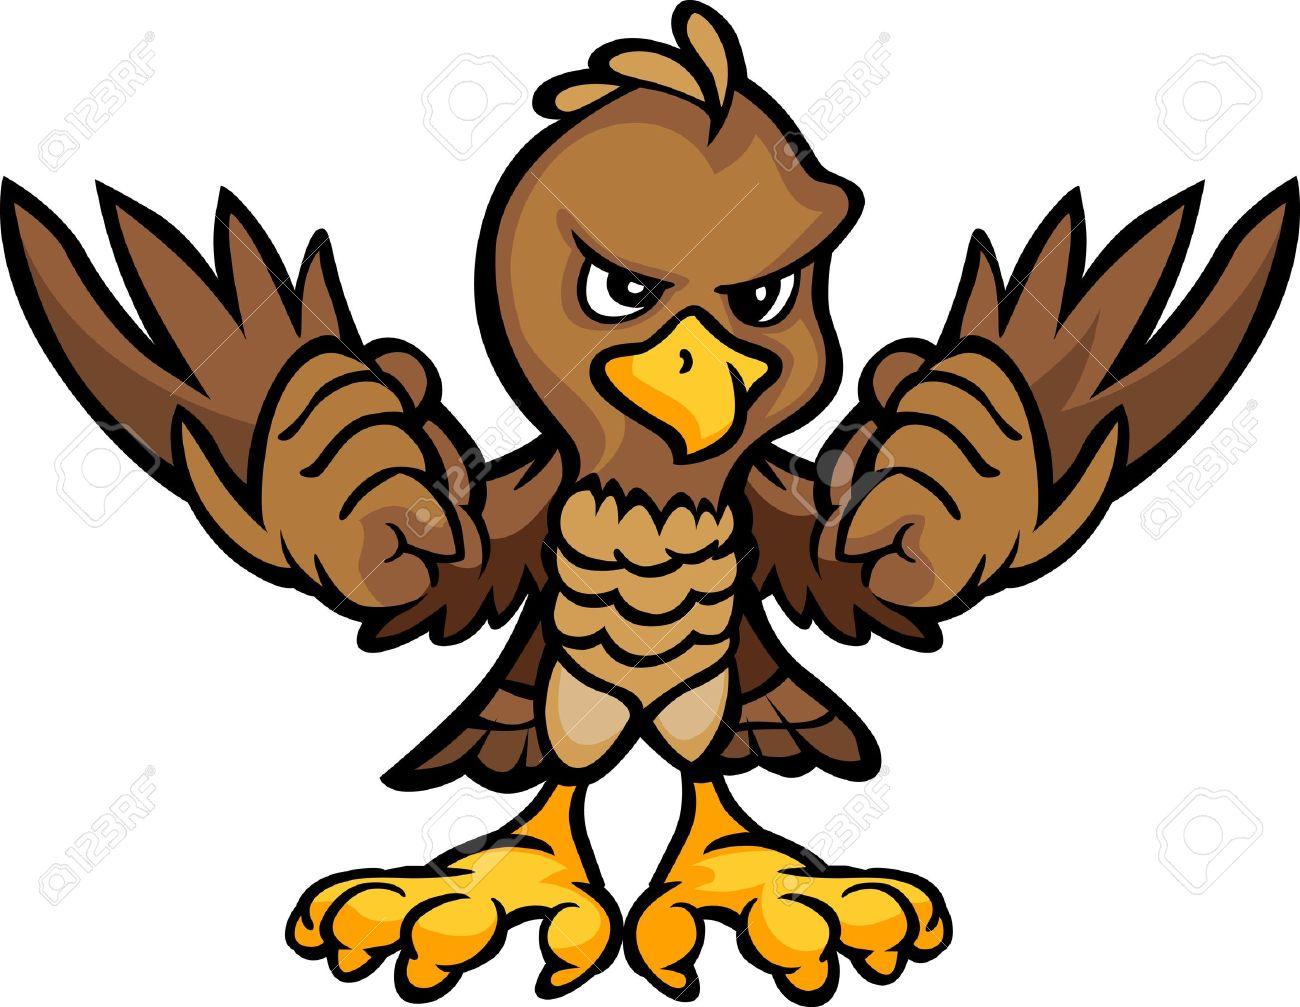 1300x1007 Cartoon Vector Image Of An Eagle Or Falcon Body Royalty Free